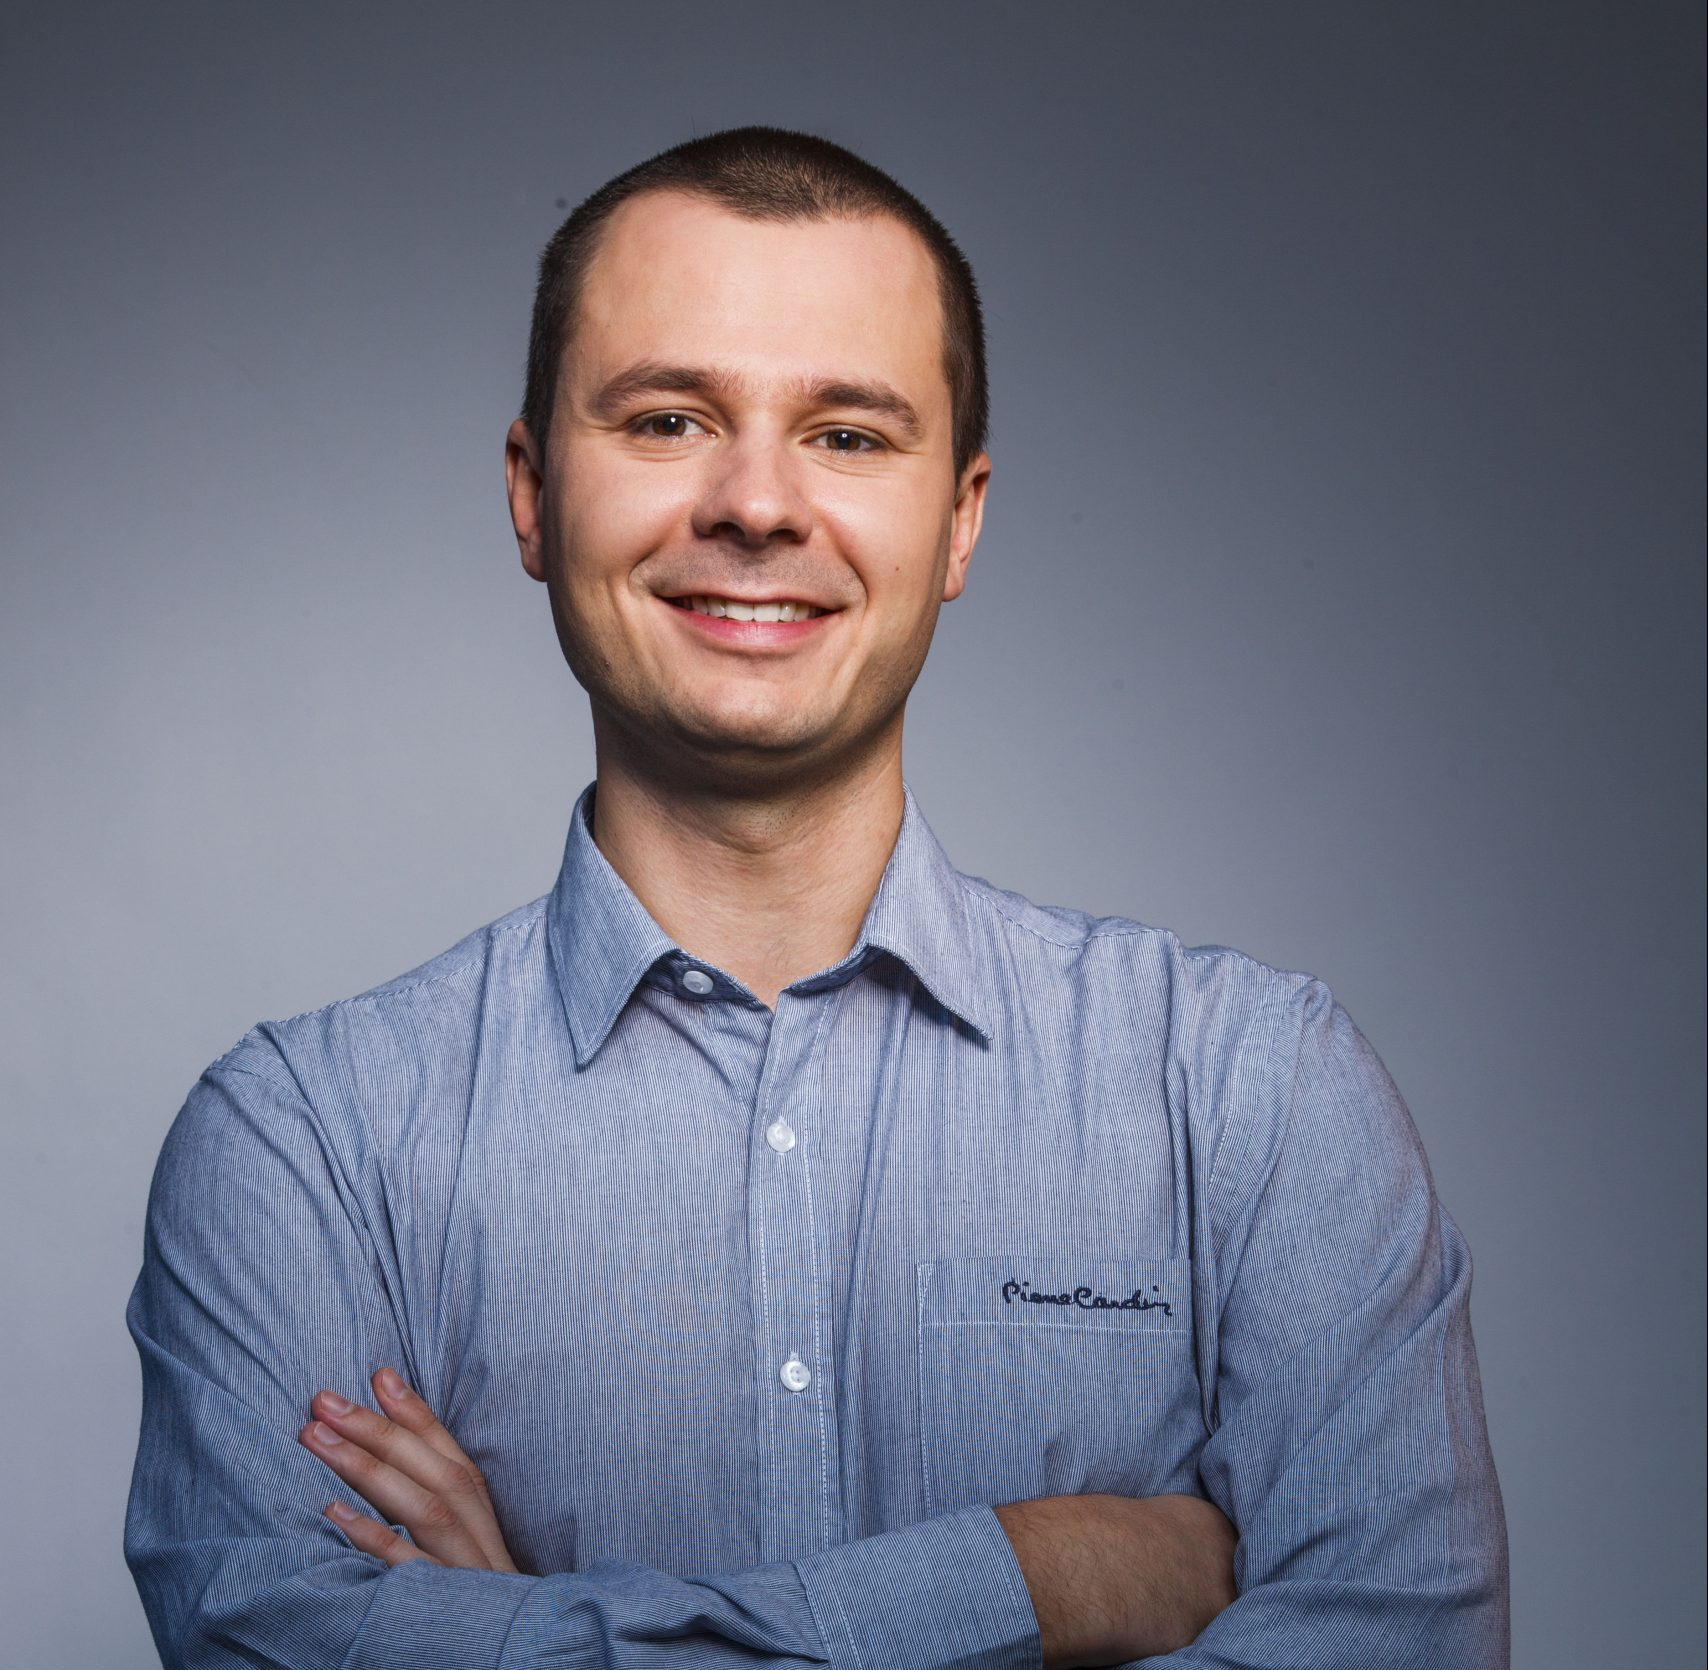 szymon profile image